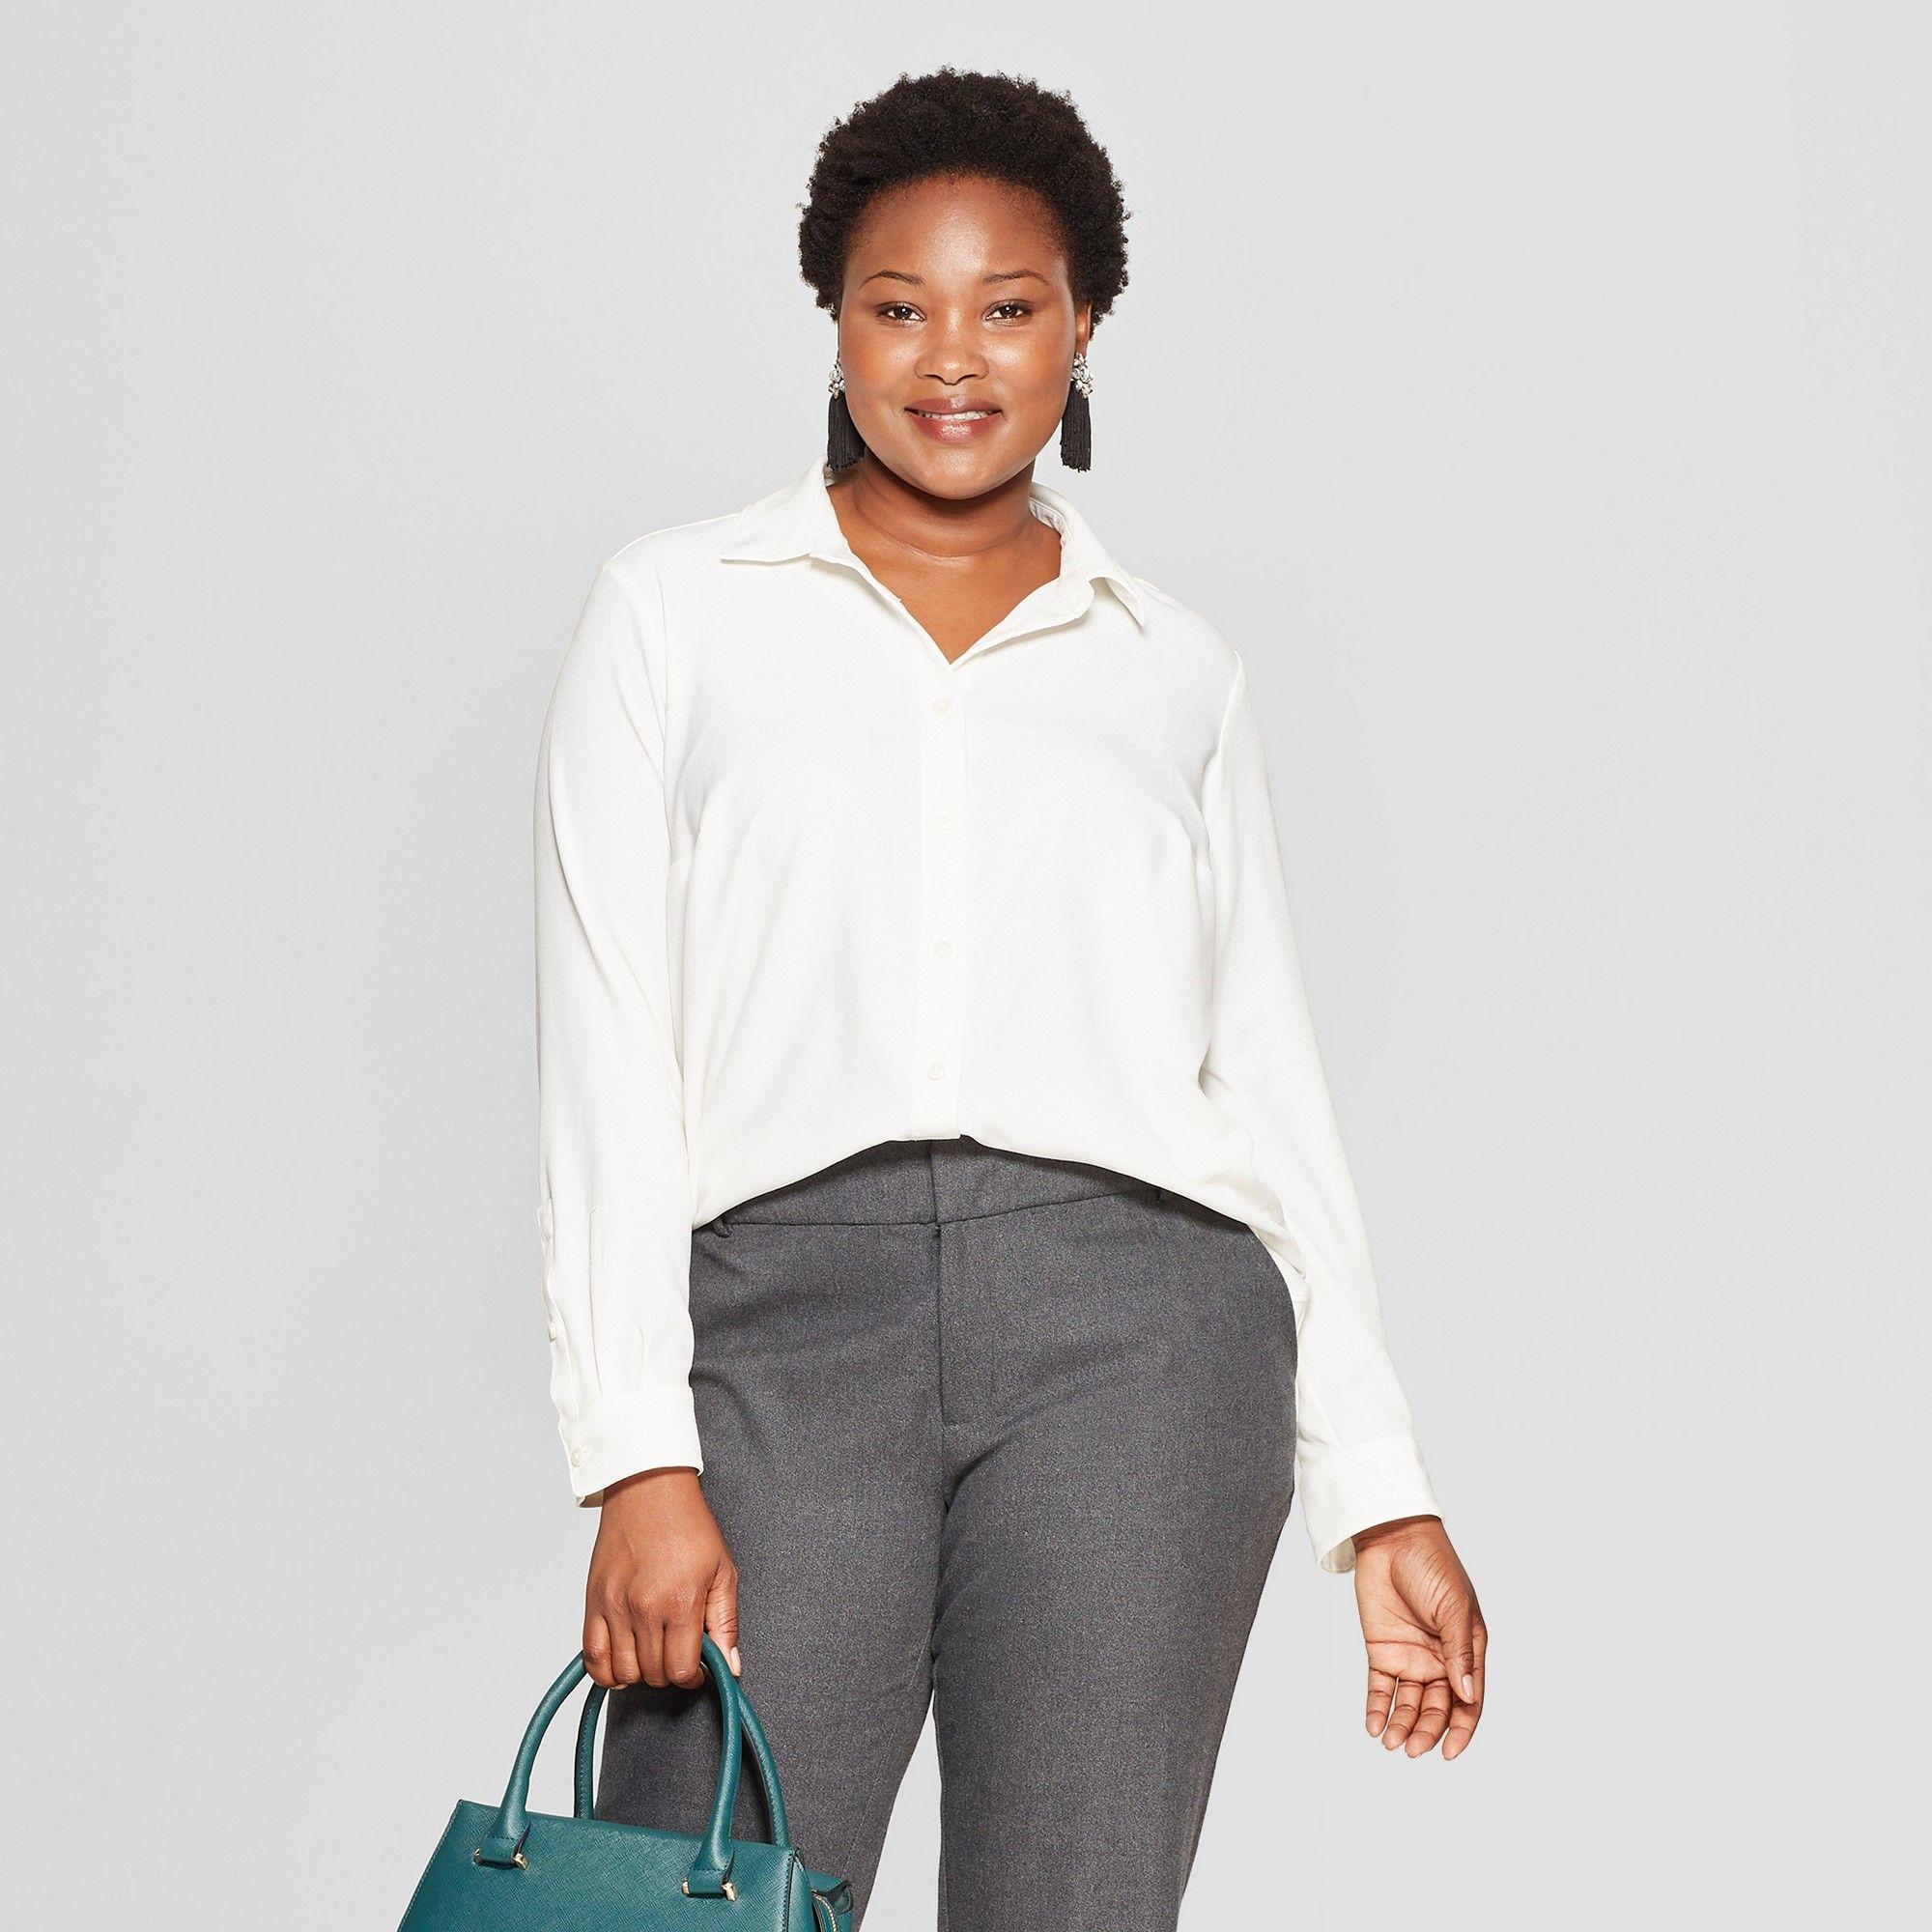 5e2f919dbb3 Women s Plus Size No Gap Button-Down Long Sleeve Blouse - Ava   Viv Cream  (Ivory) 1X